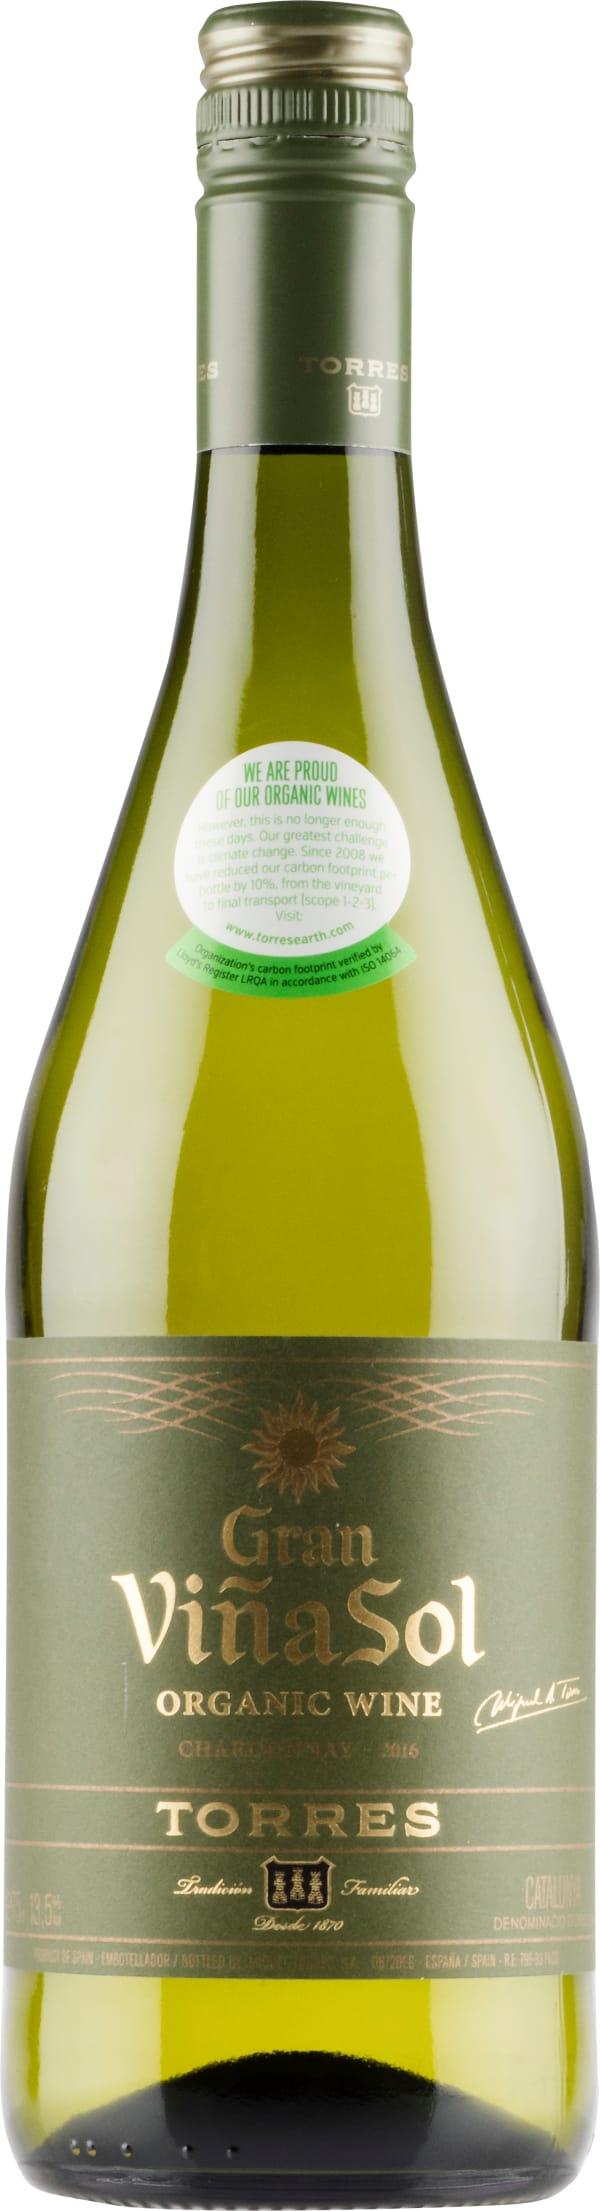 Torres Gran Viña Sol Chardonnay 2017